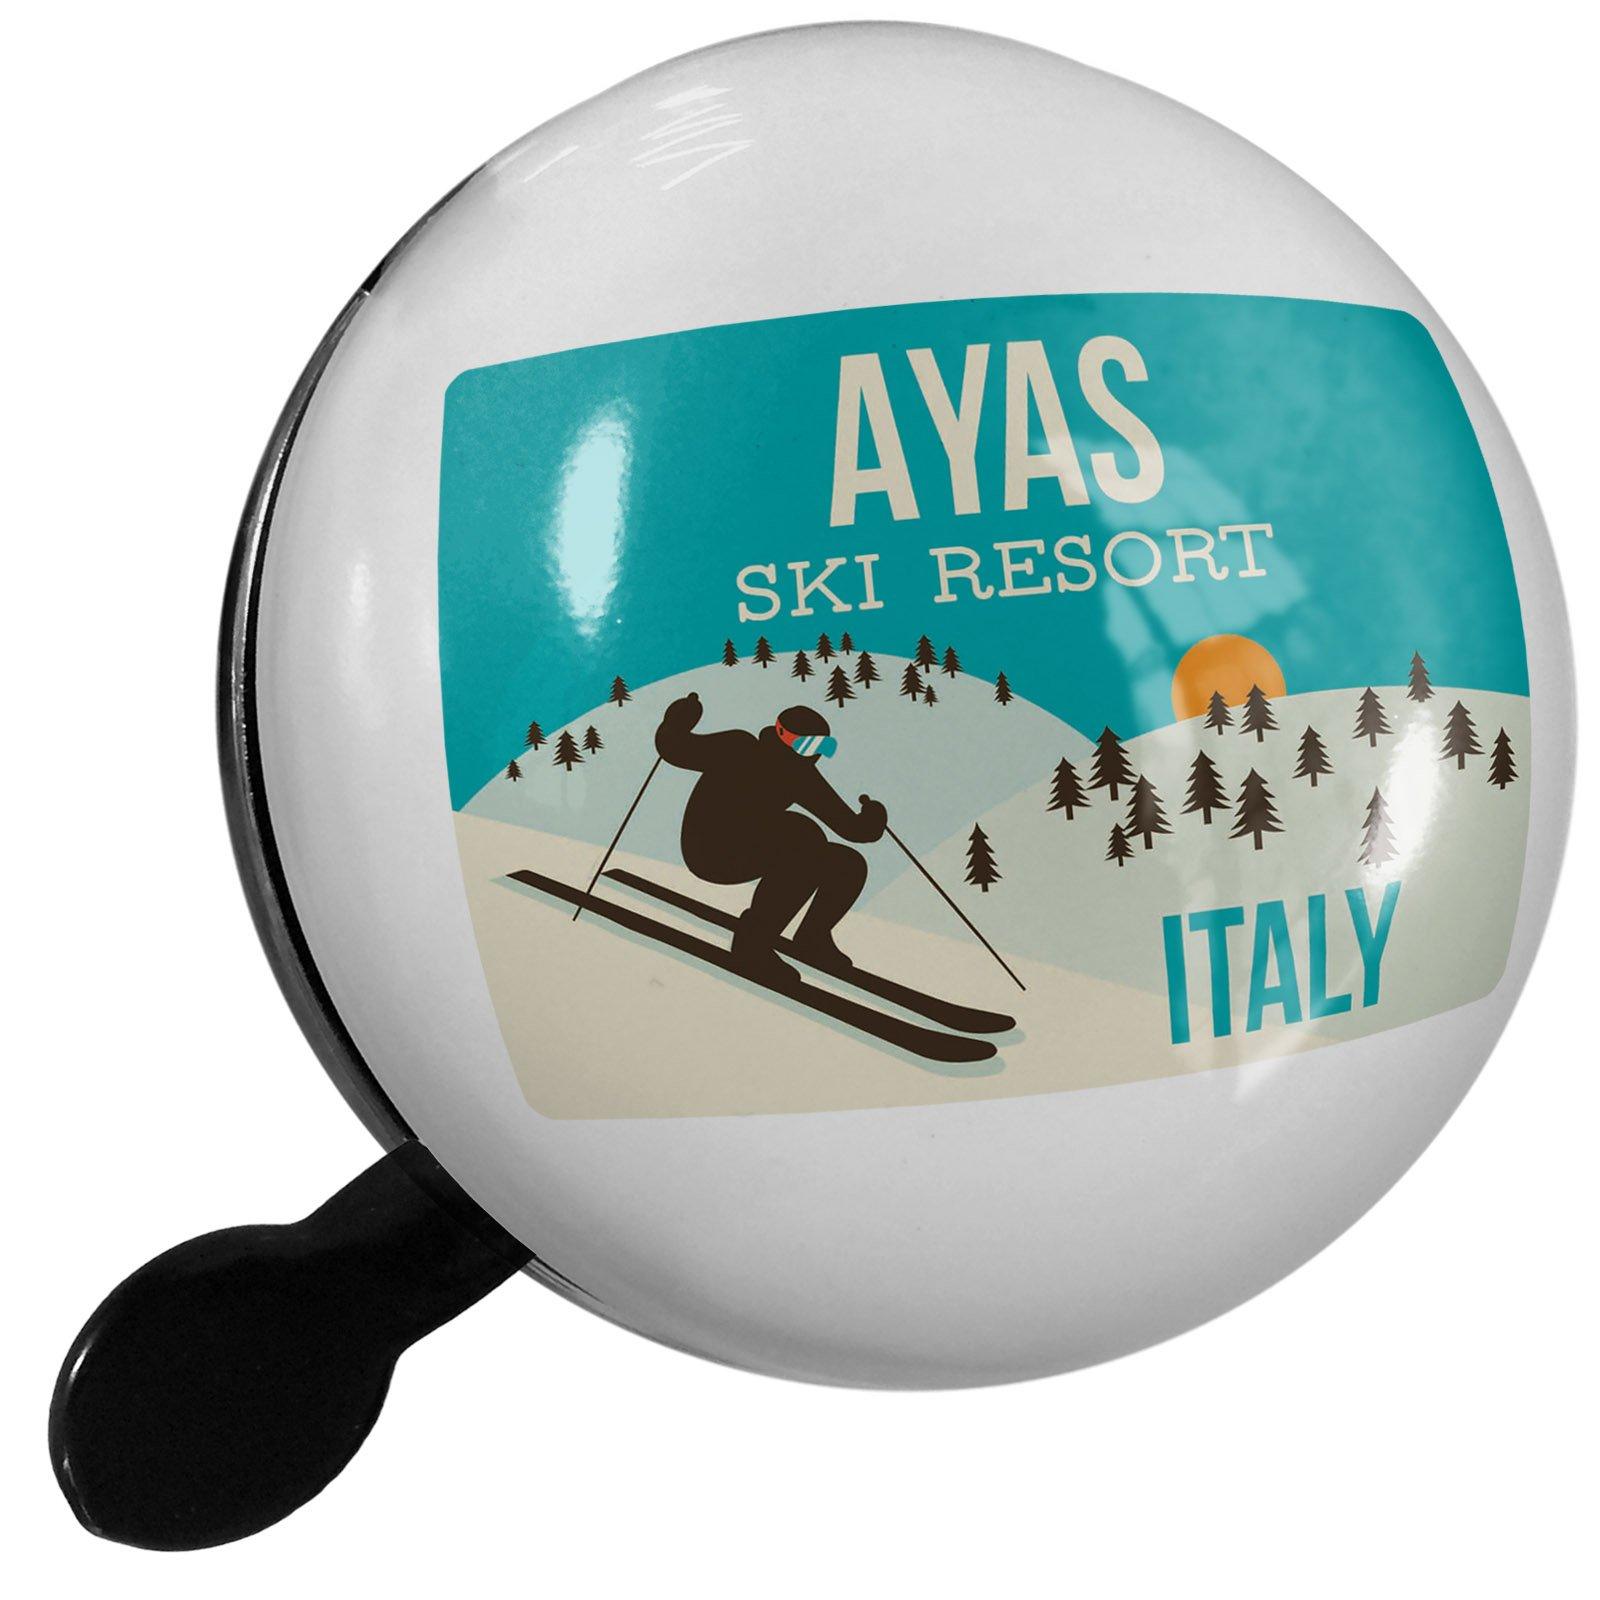 Small Bike Bell Ayas Ski Resort - Italy Ski Resort - NEONBLOND